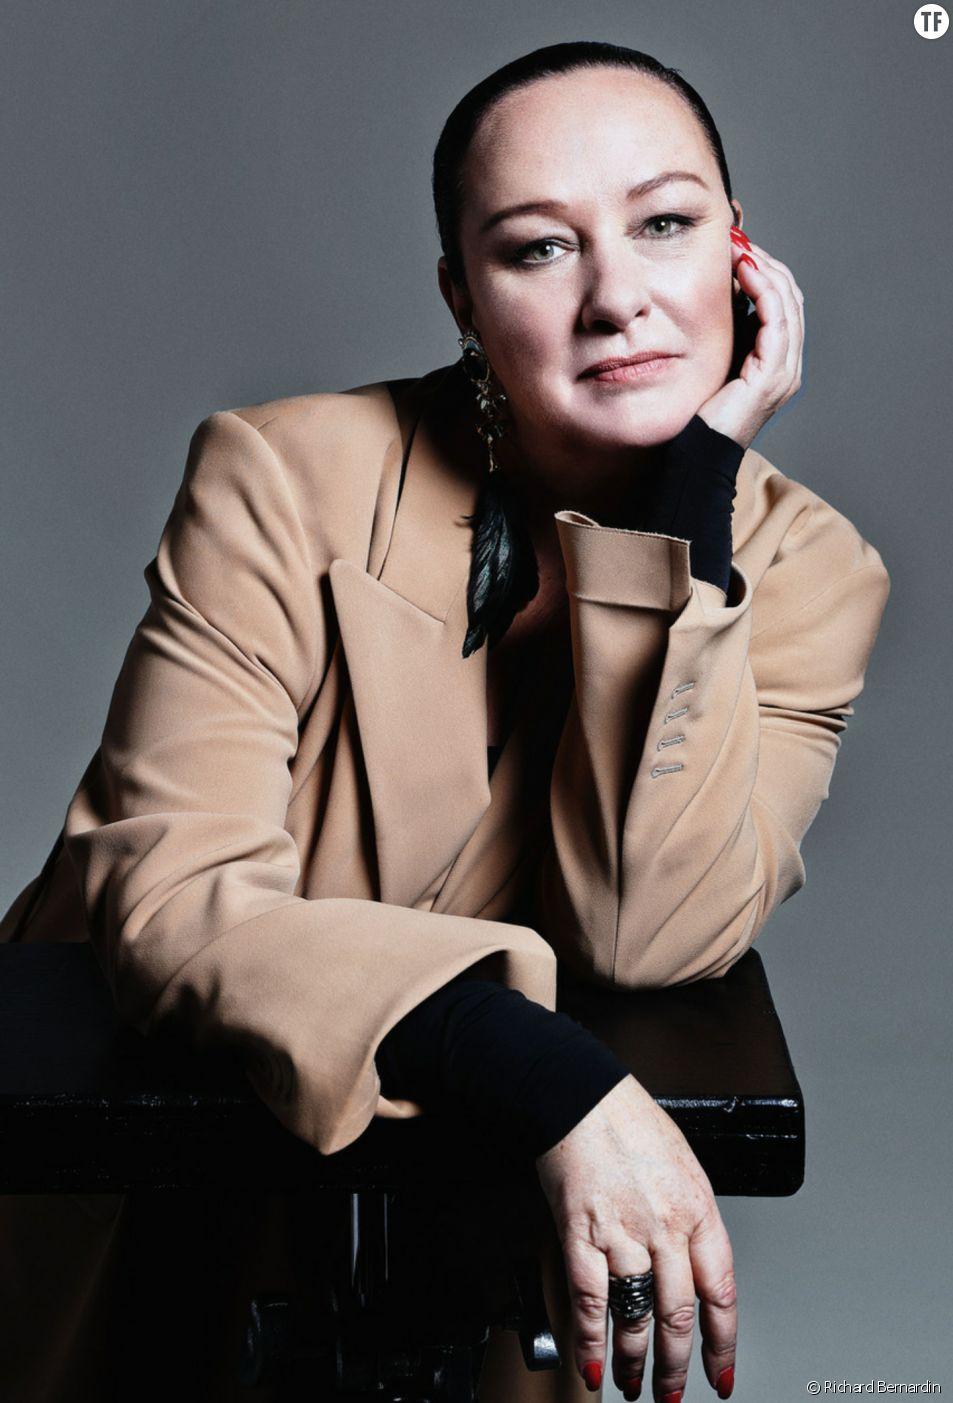 Portrait de Phoebe Greenberg